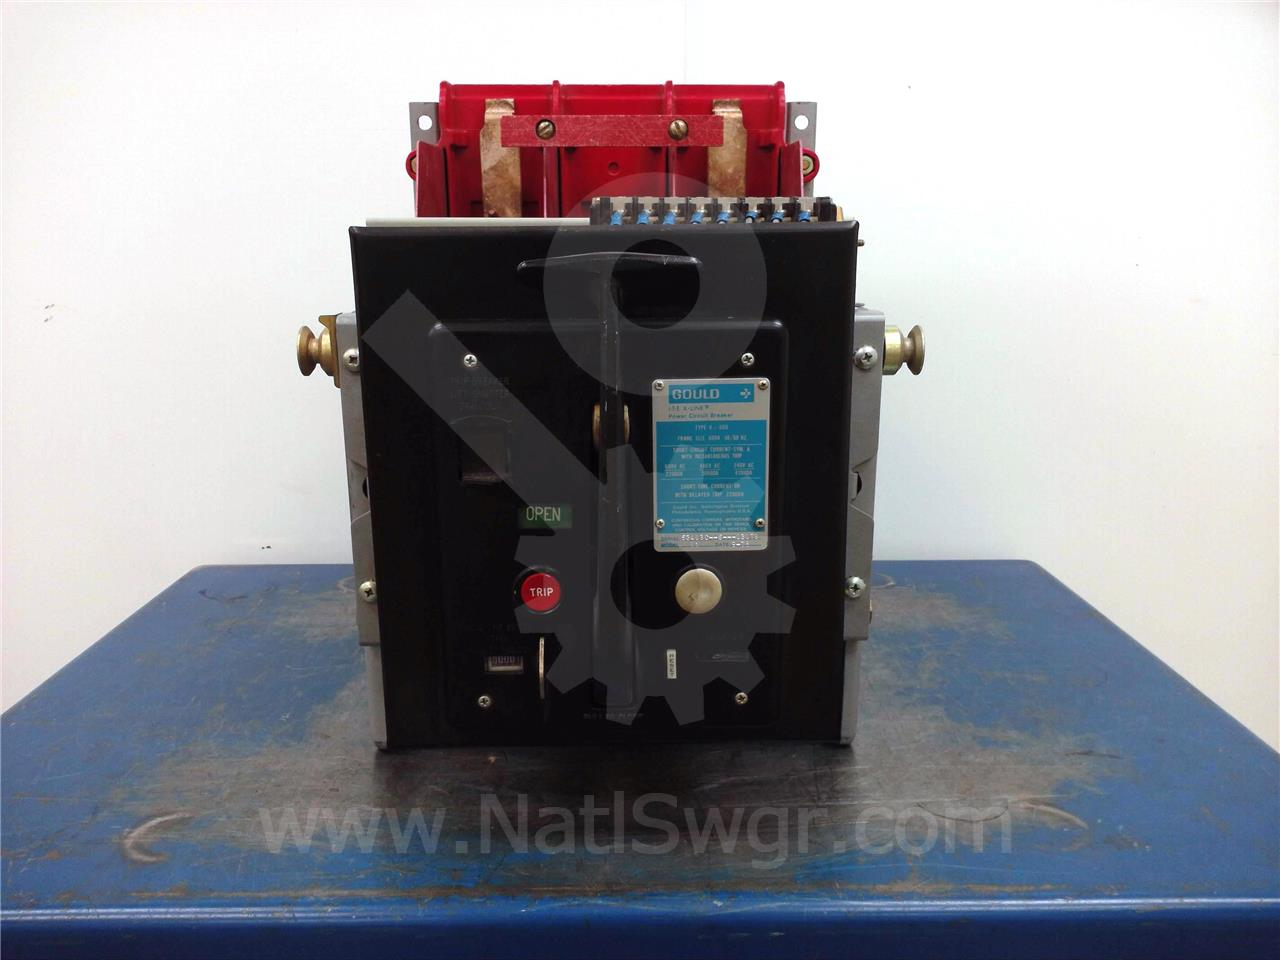 K-600 600A ITE RED MO/DO DC TWO POLE OD-4 LS 150VDC, BELL ALARM